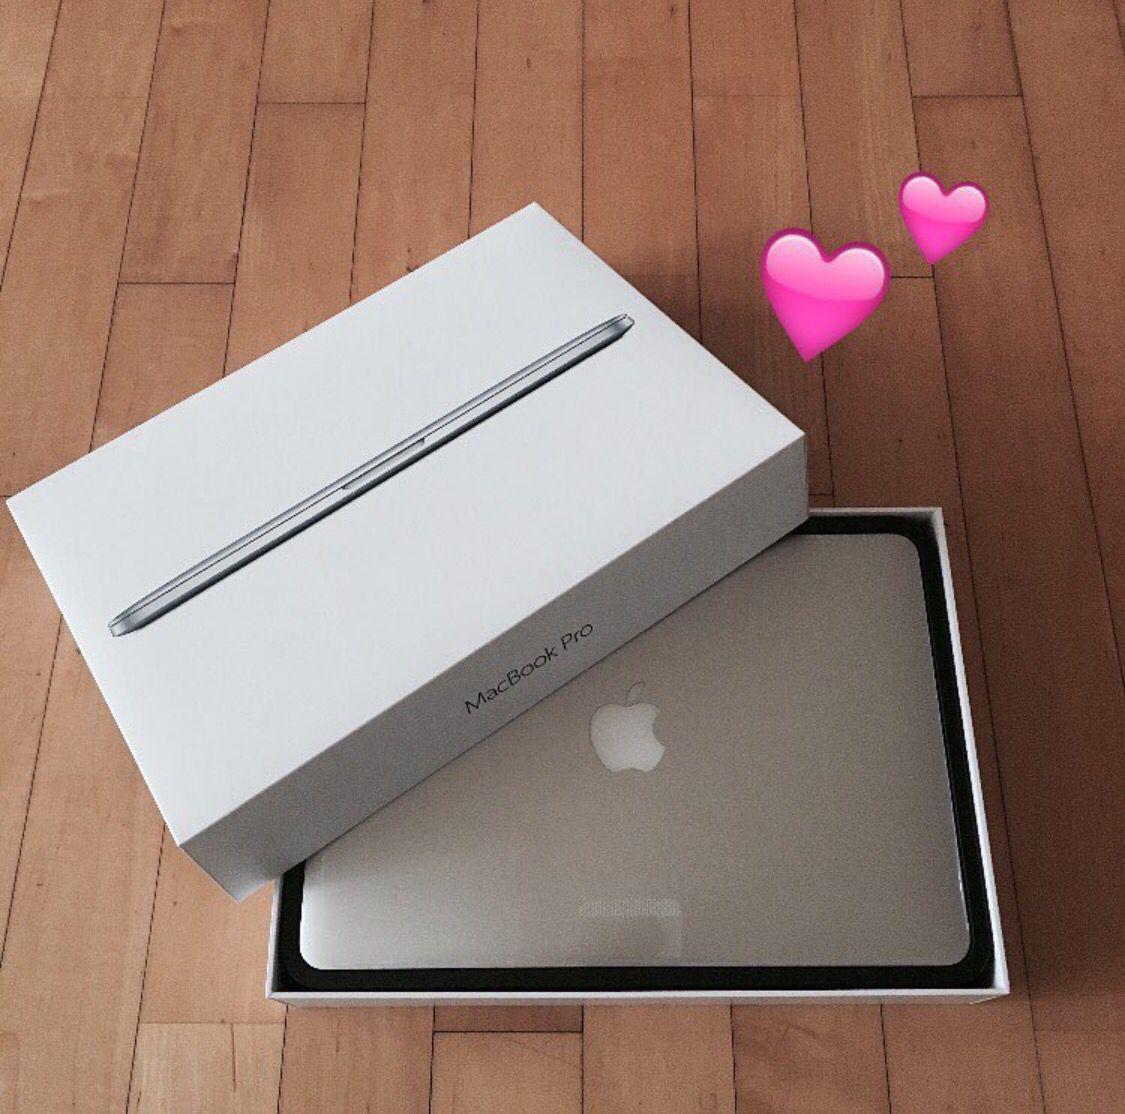 Macbook Pro Macbook Pro Macbook Macbook Pro Accessories